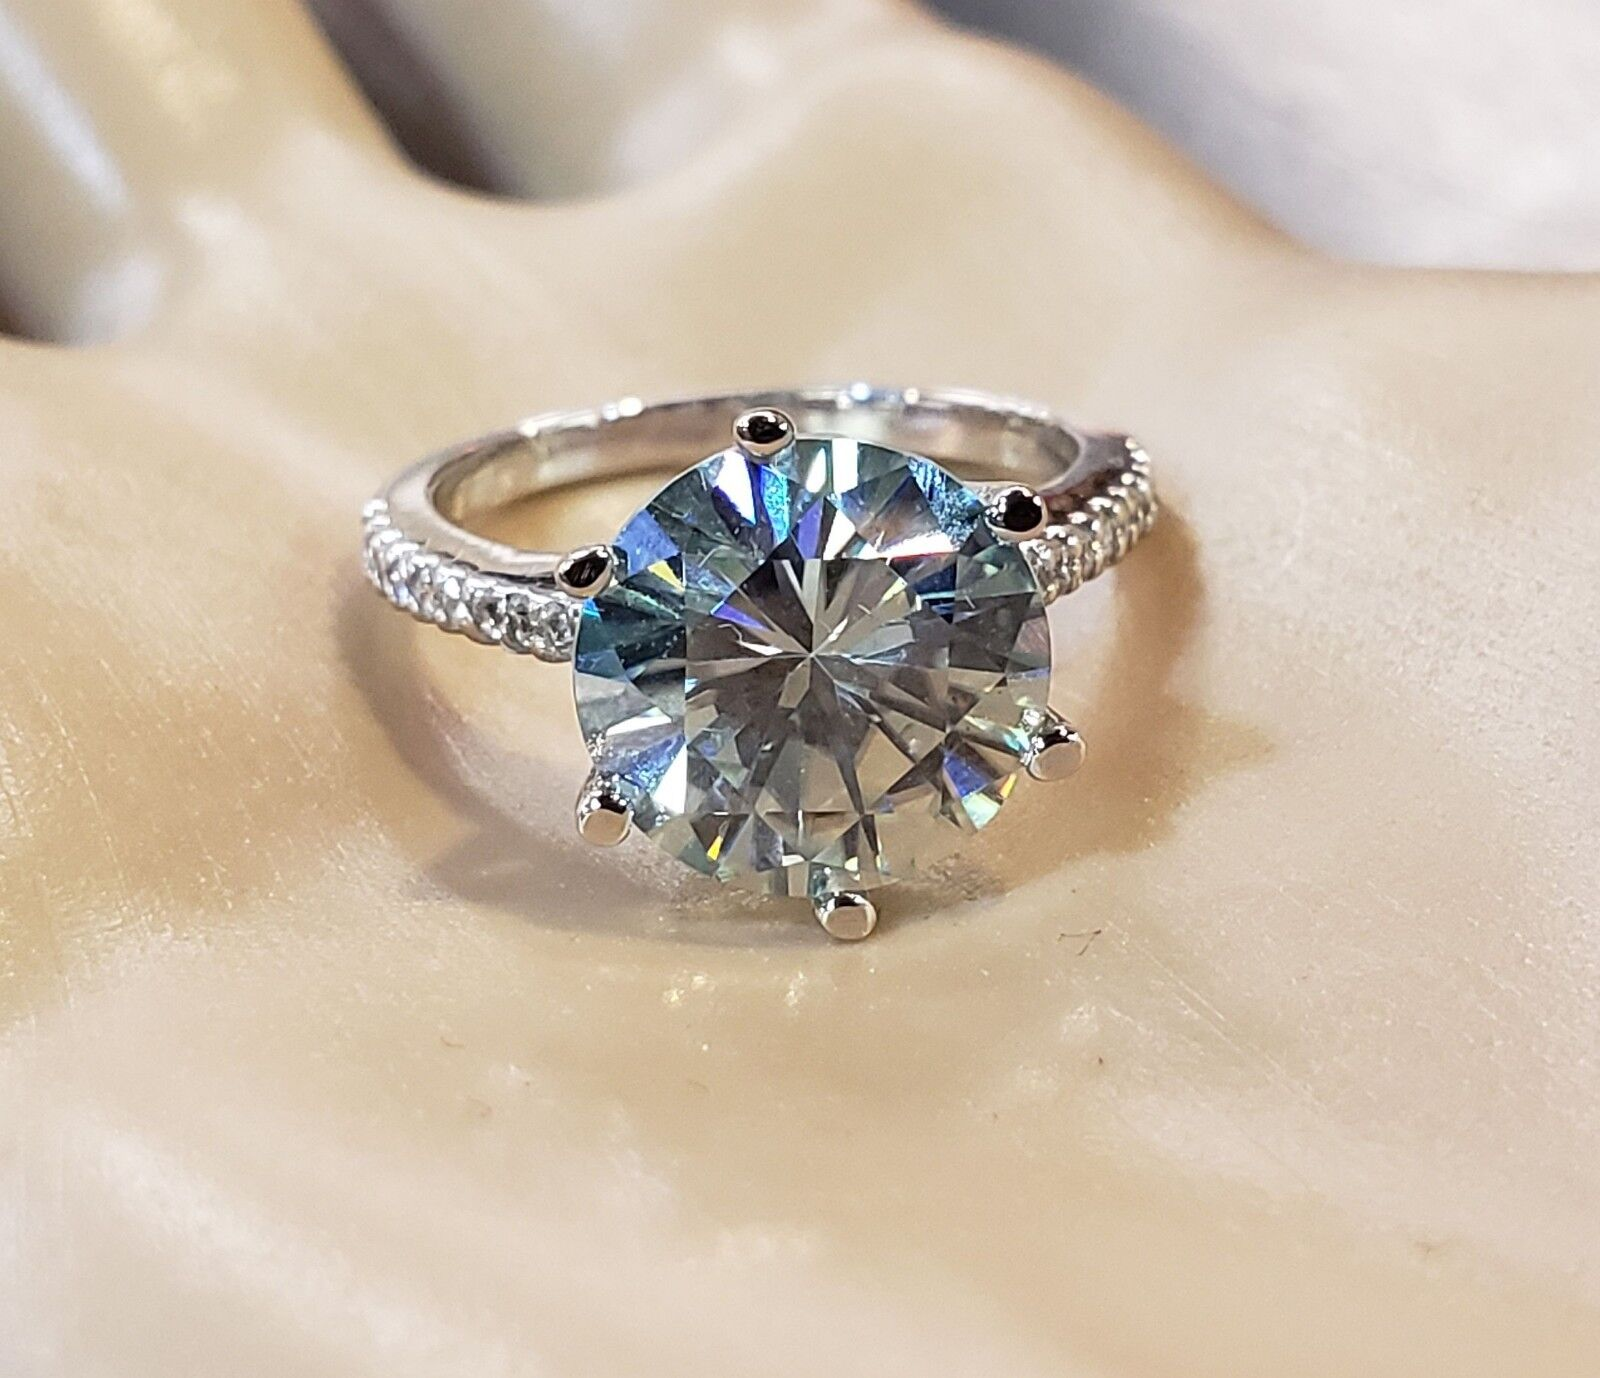 14K WHITE gold 3.60cttw blueE  GREEN MOISSANITE DIAMOND BEAUTIFUL FIREY RING